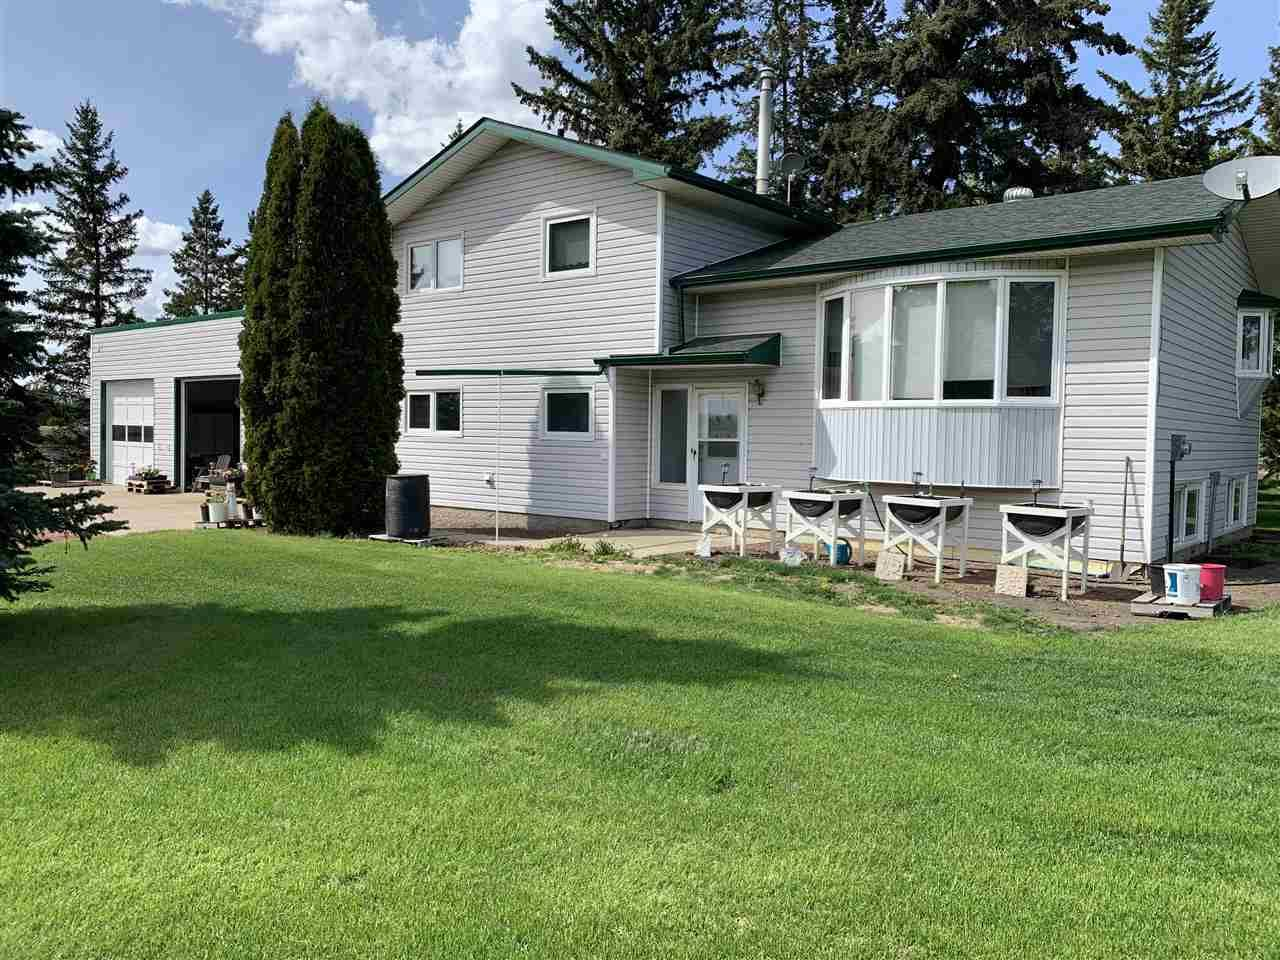 Main Photo: 25328 TWP RD 580: Rural Sturgeon County House for sale : MLS®# E4230642